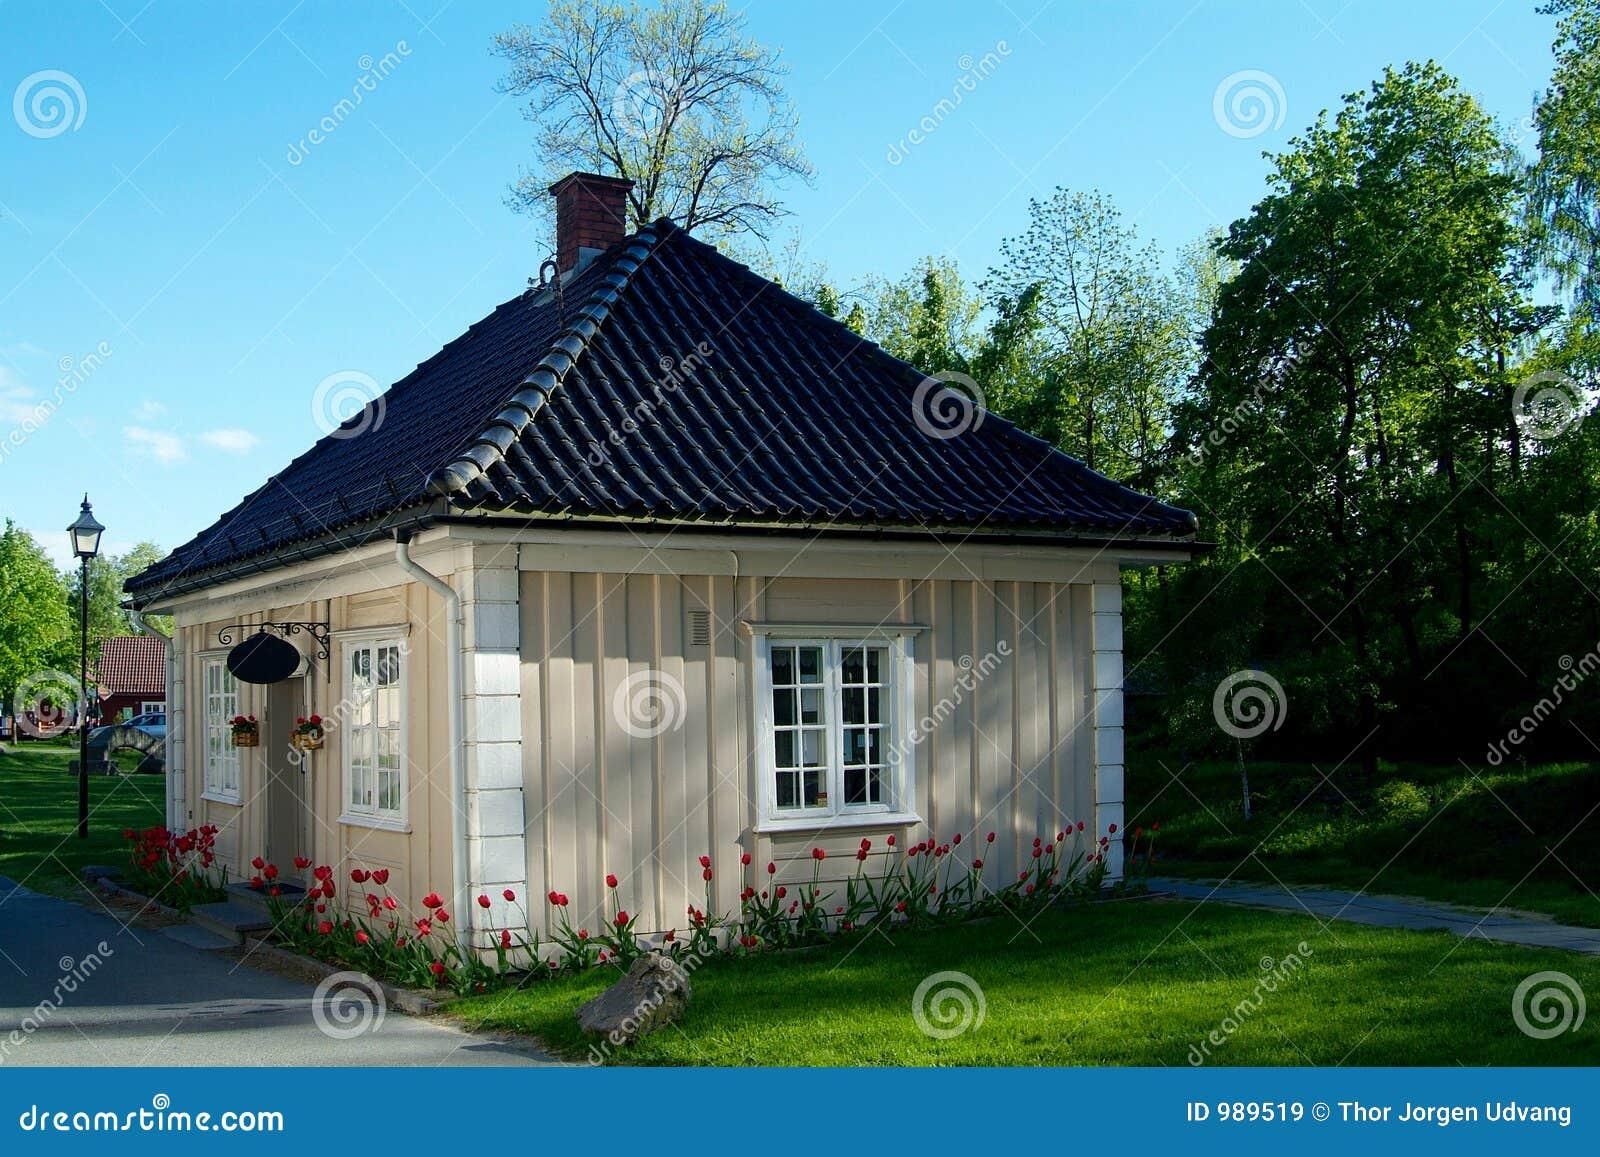 Peque a casa de madera im genes de archivo libres de - Casa pequena de madera ...